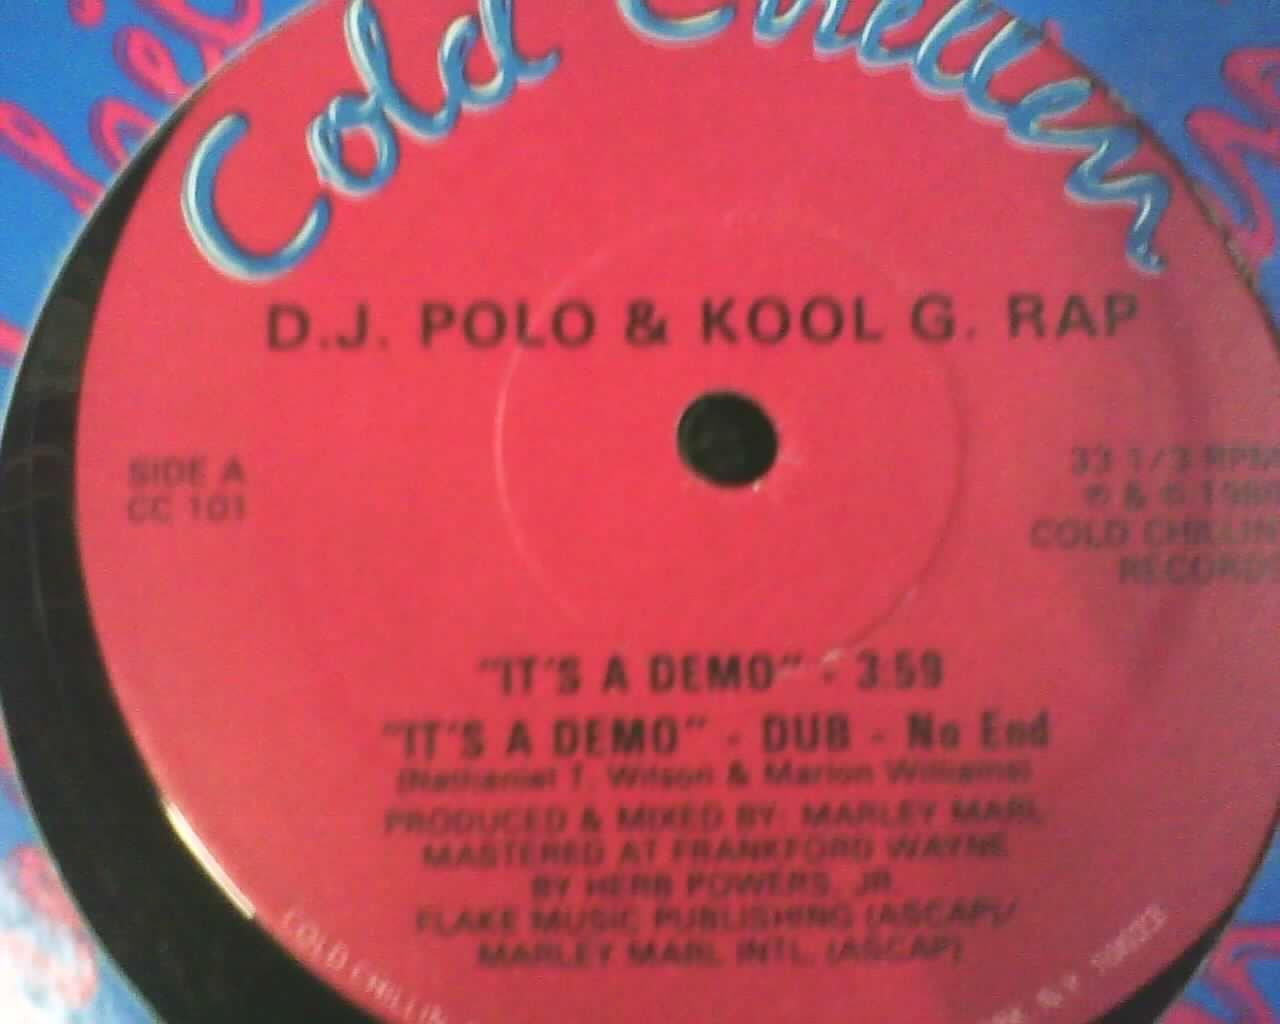 It S a Demo : Kool G Rap, DJ Polo: Amazon.es: Música